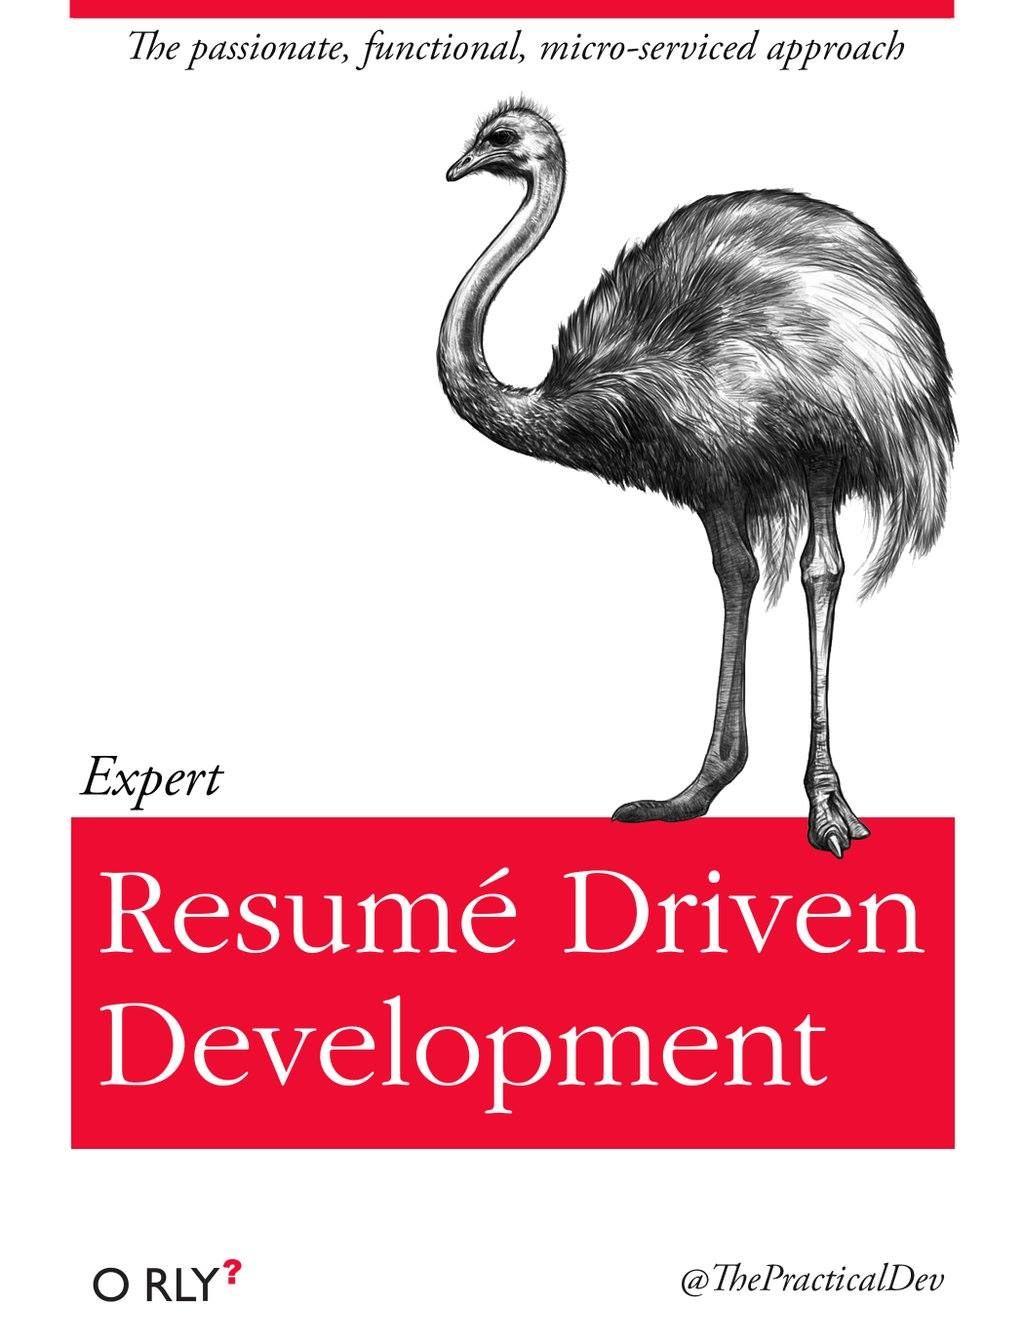 o rly resume driven development funny resume resume driven development